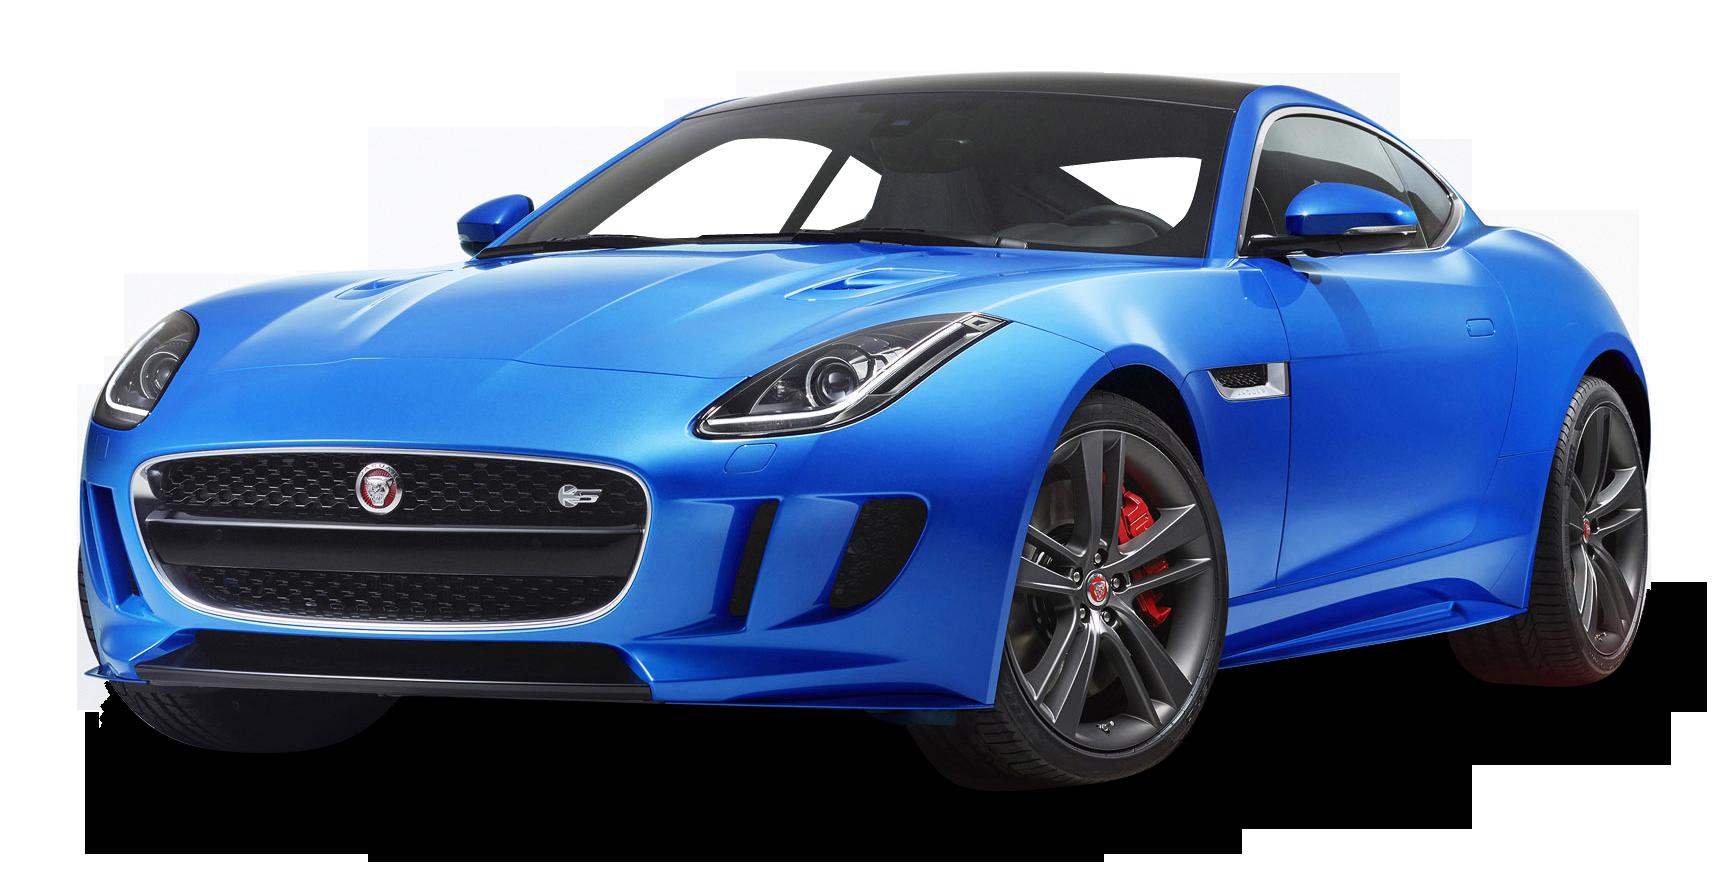 Blue Jaguar F TYPE Luxury Sports Car